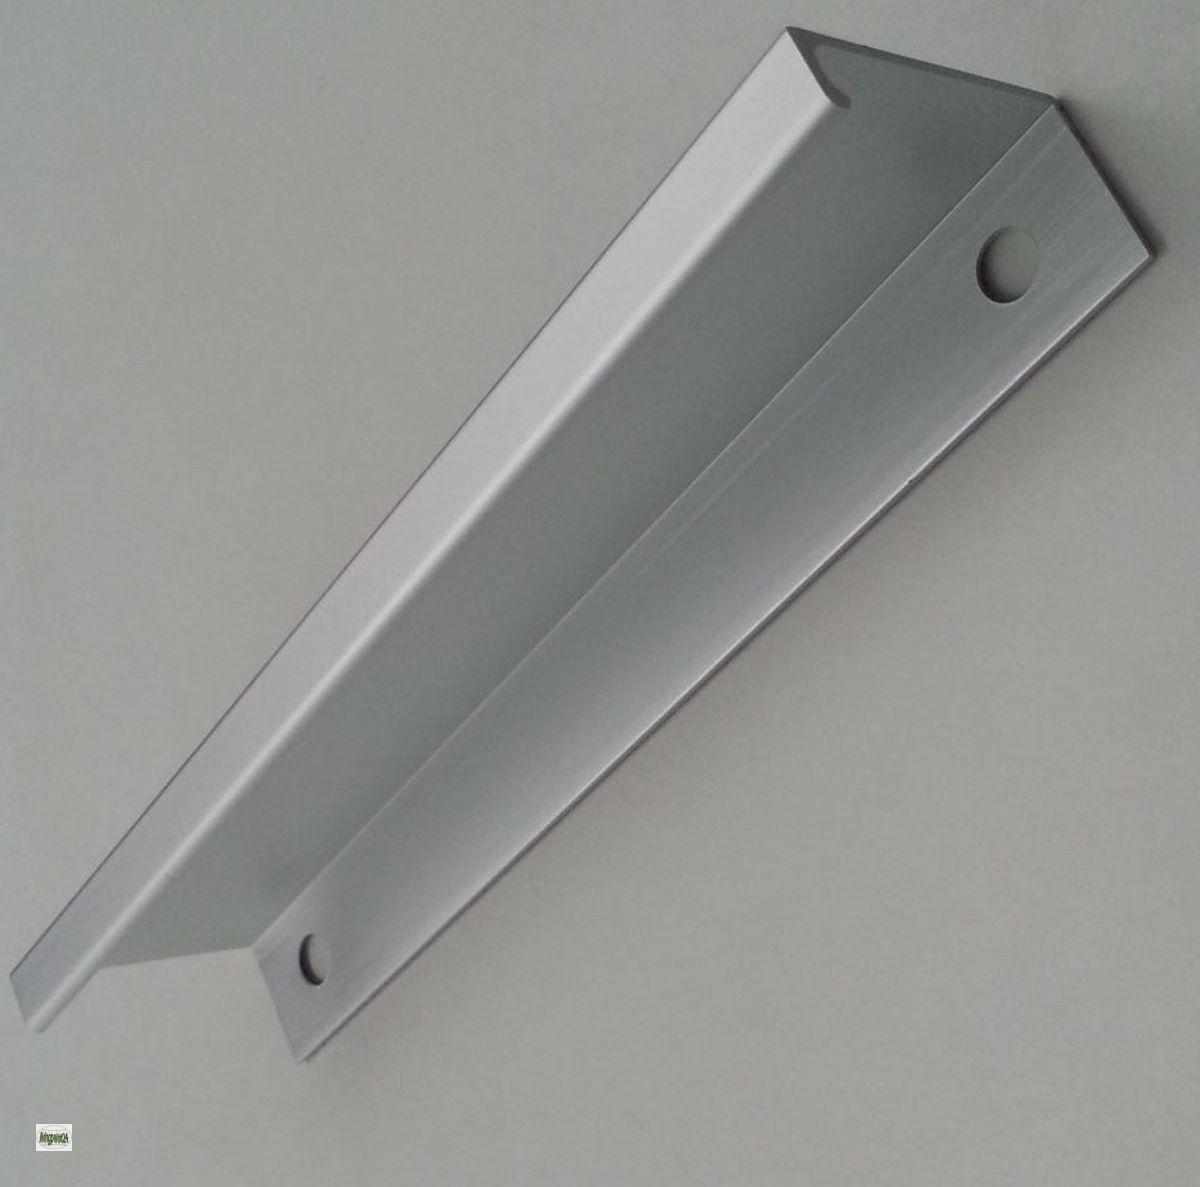 poign e de meubles ba 128mm tiroirs poign es profil aluminium mat cuisine n ebay. Black Bedroom Furniture Sets. Home Design Ideas